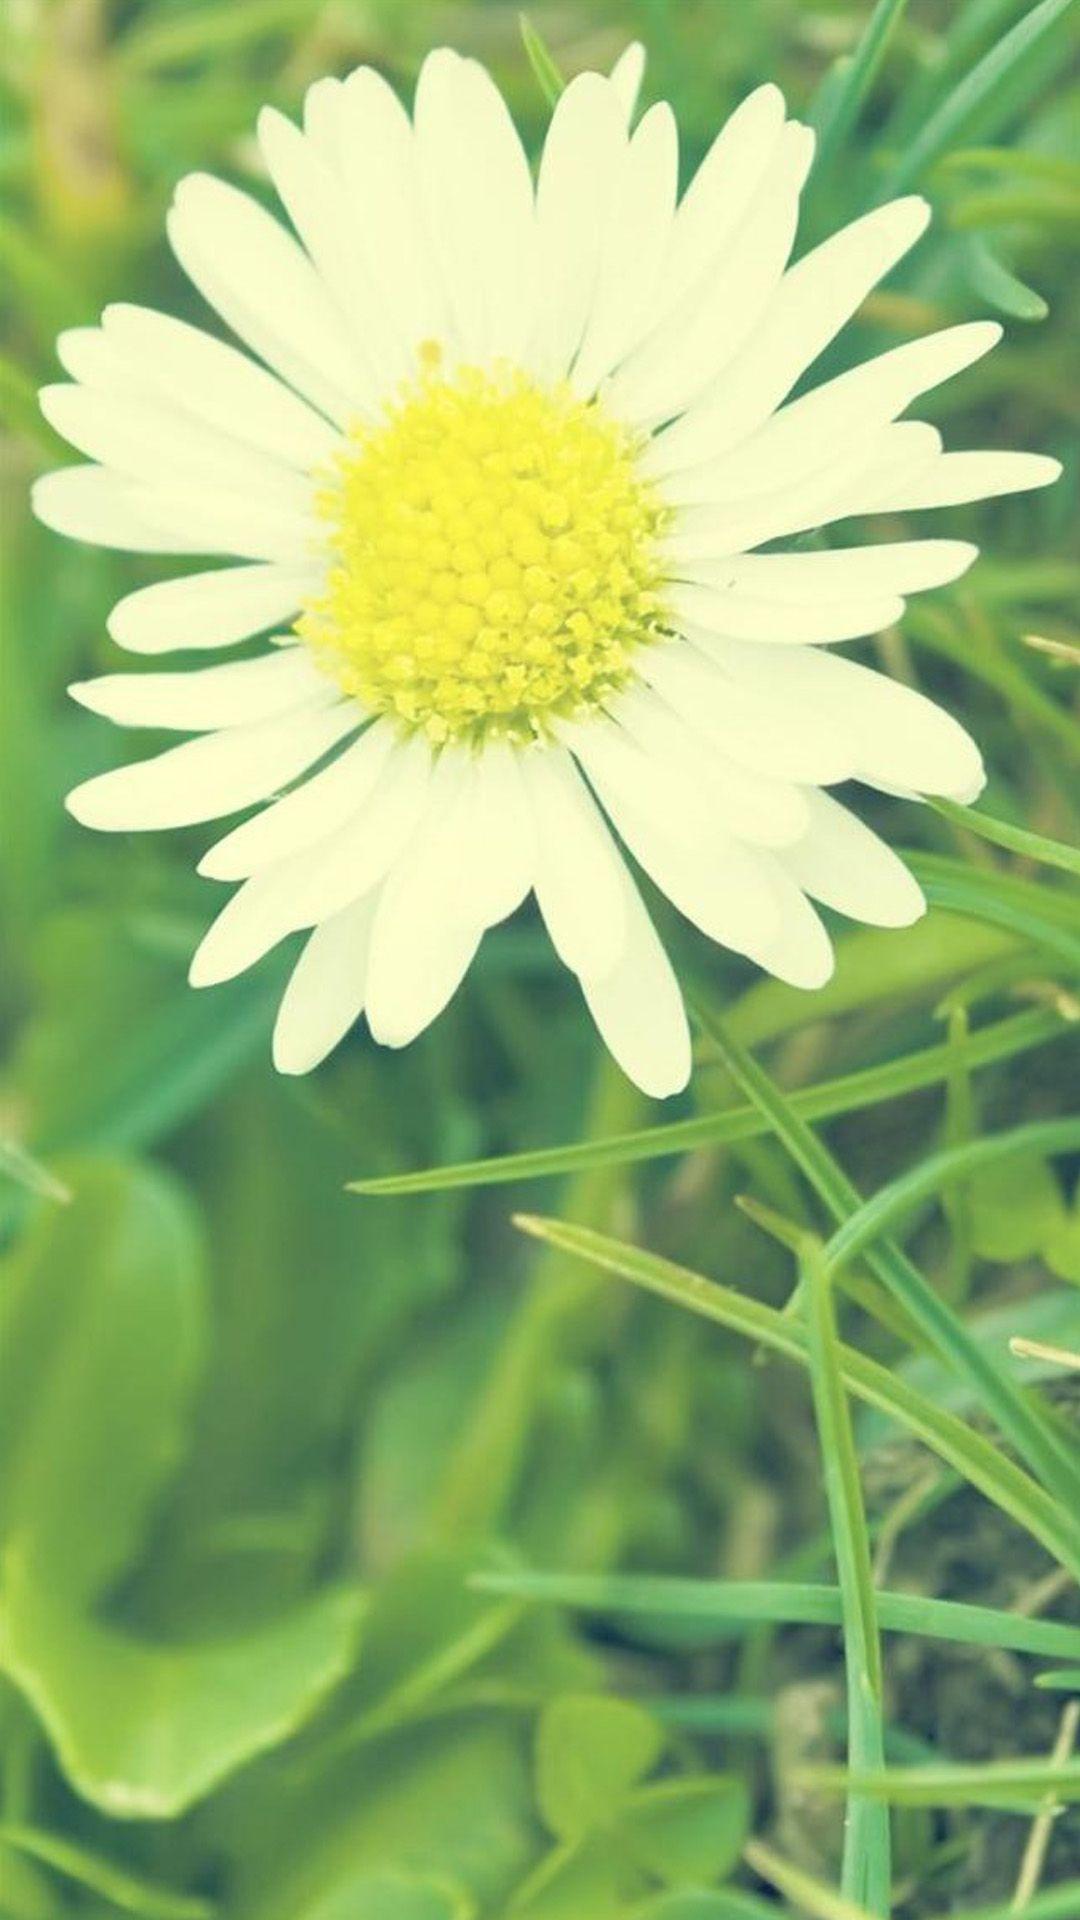 White Sunshine Daisy Flower Melhores fundos para iphone